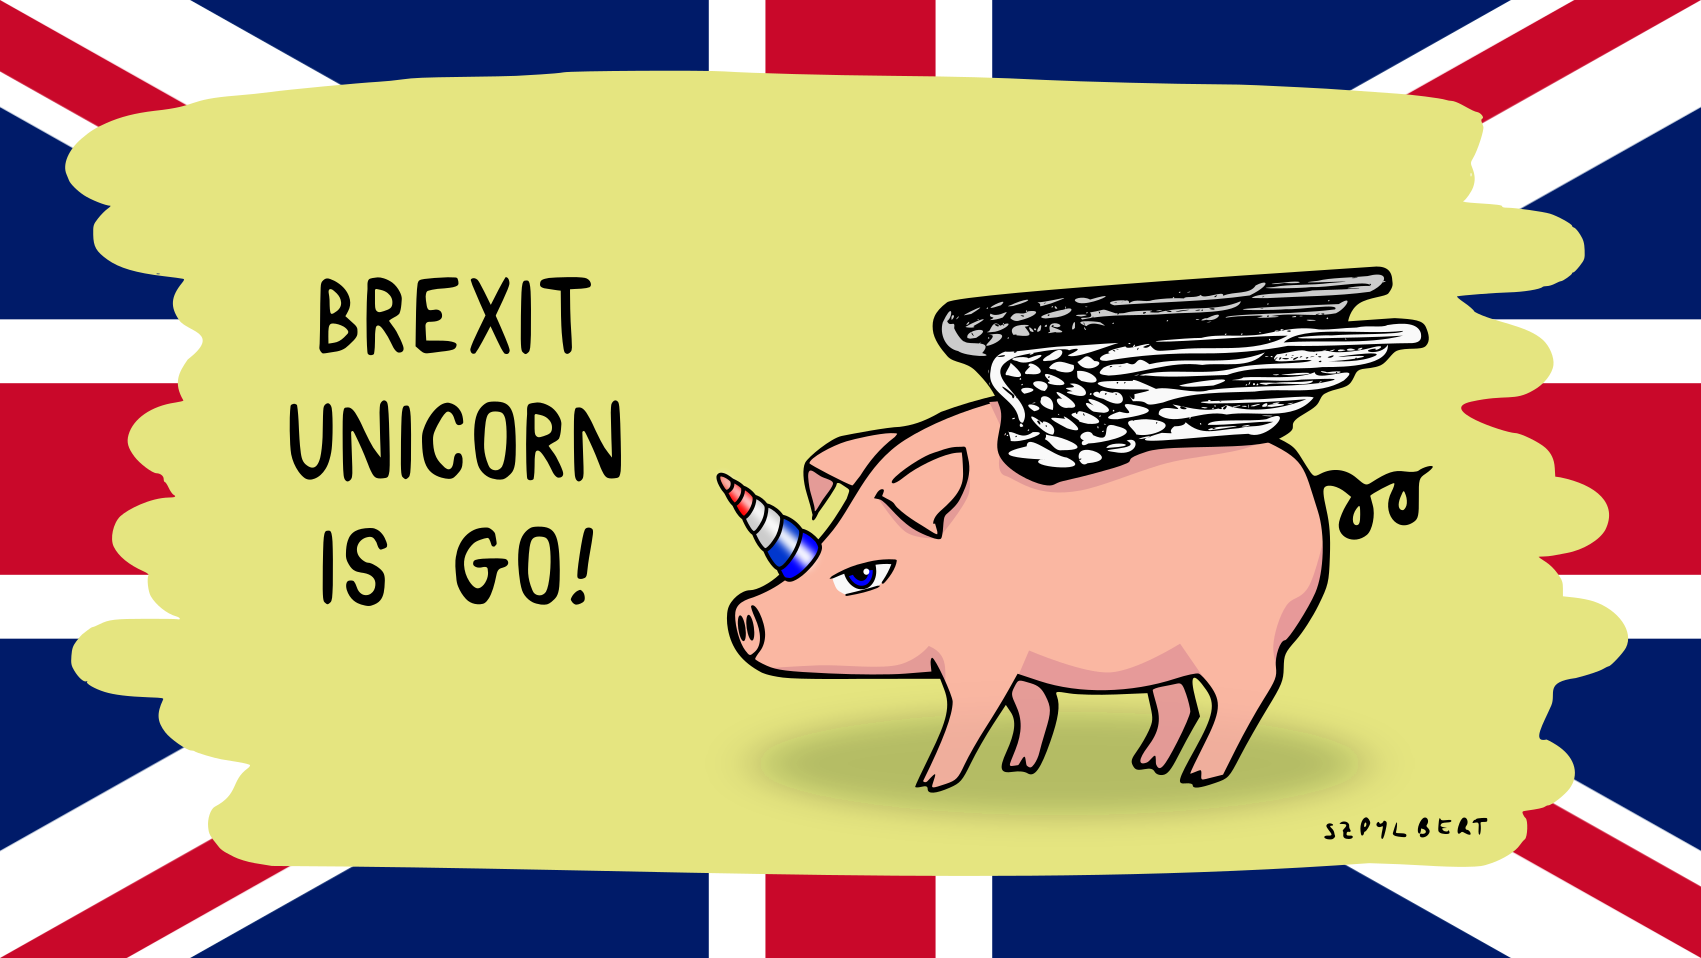 Brexit unicorn, Szpylbert (c) 2020